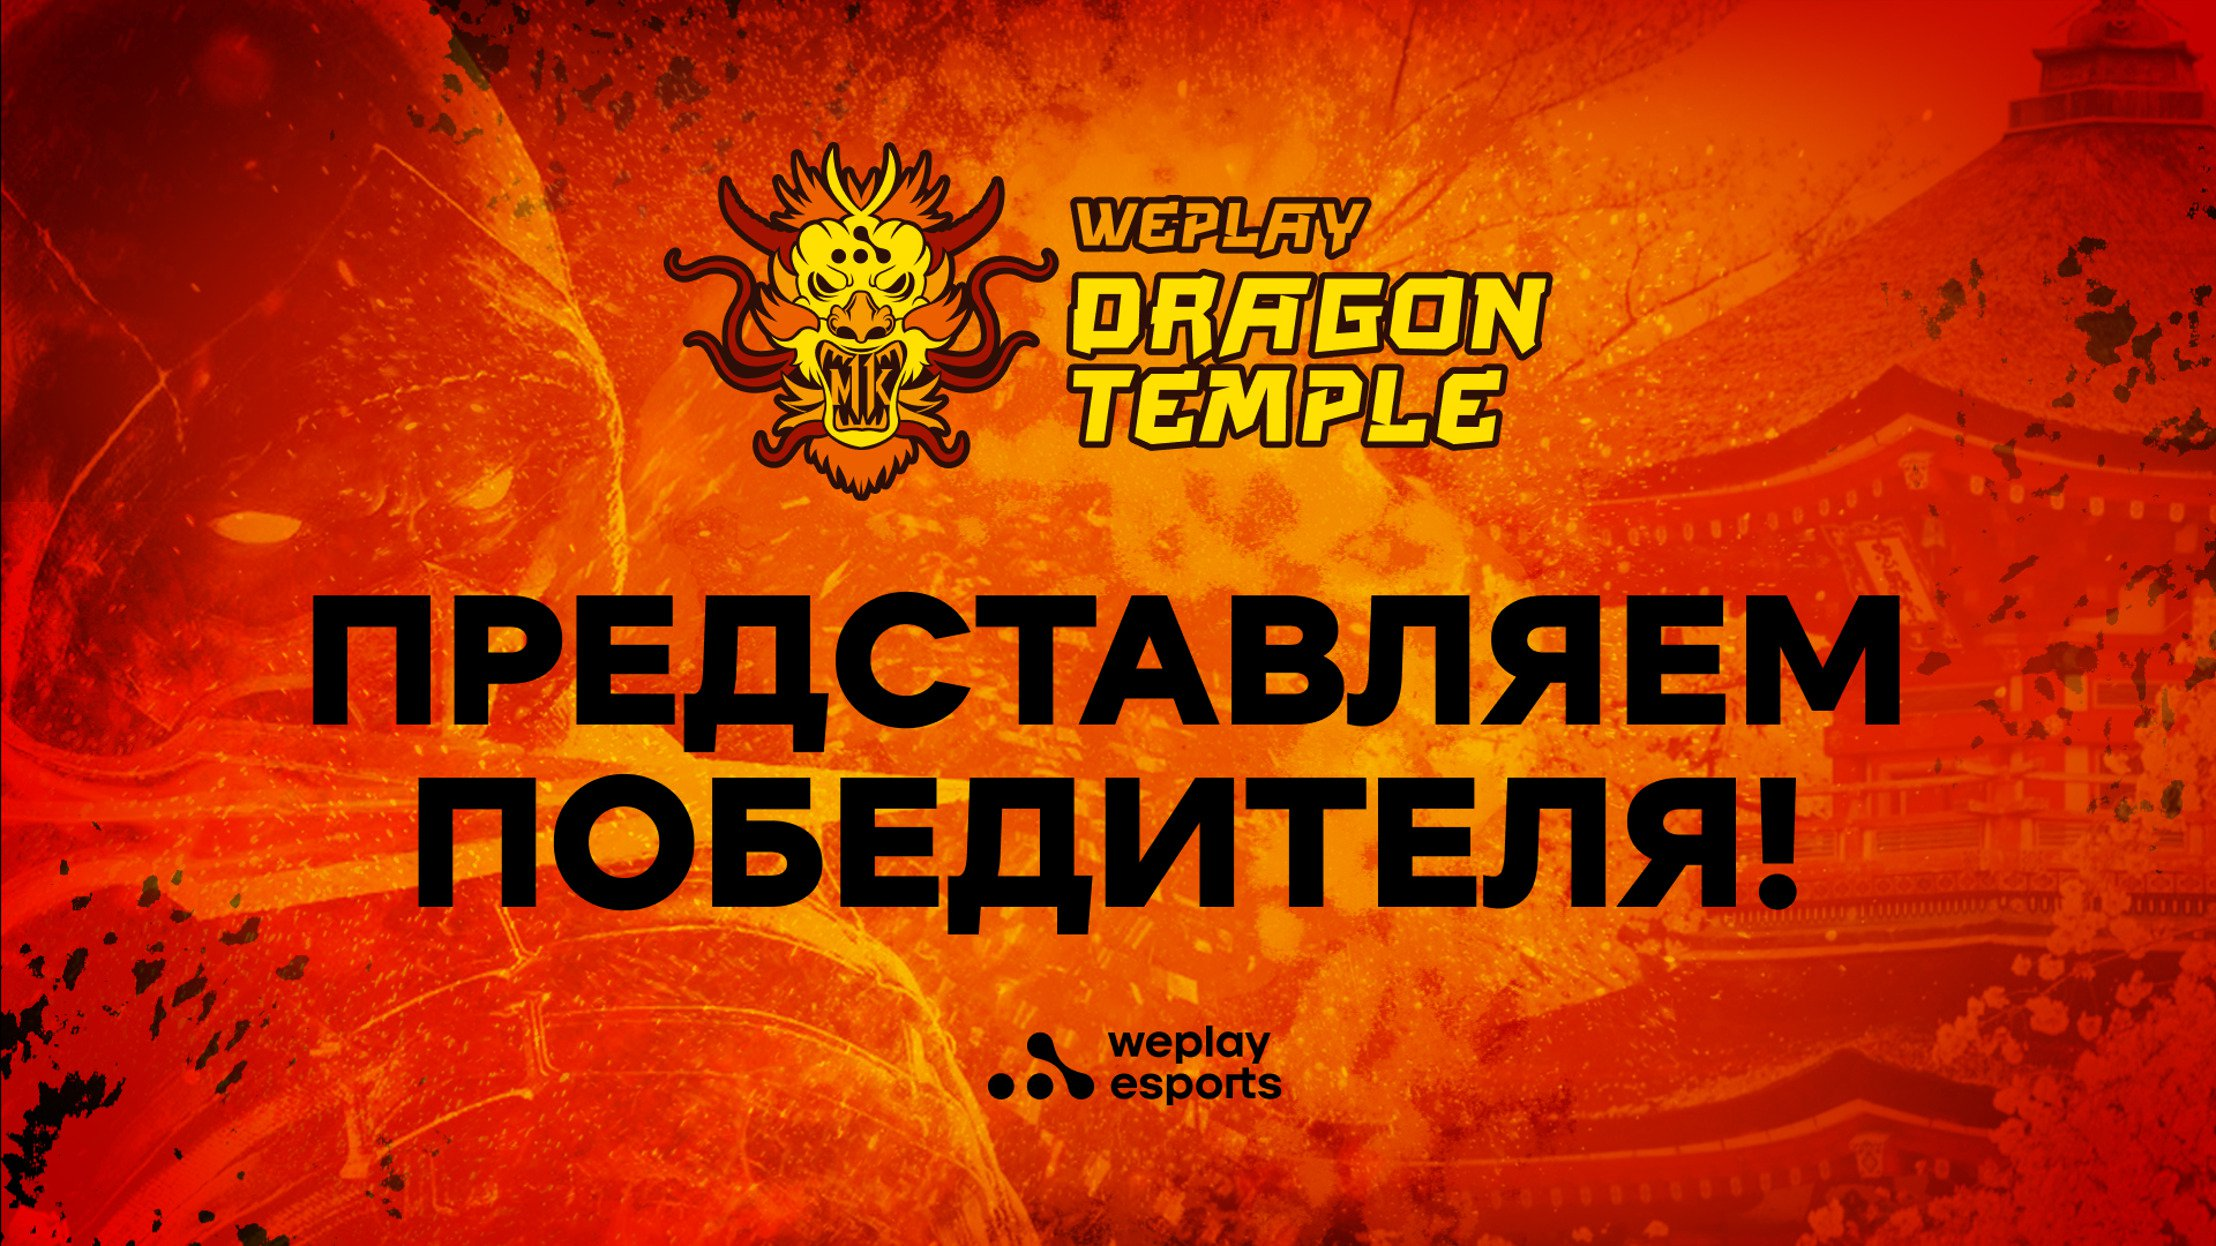 Представляем победителя WePlay Dragon Temple